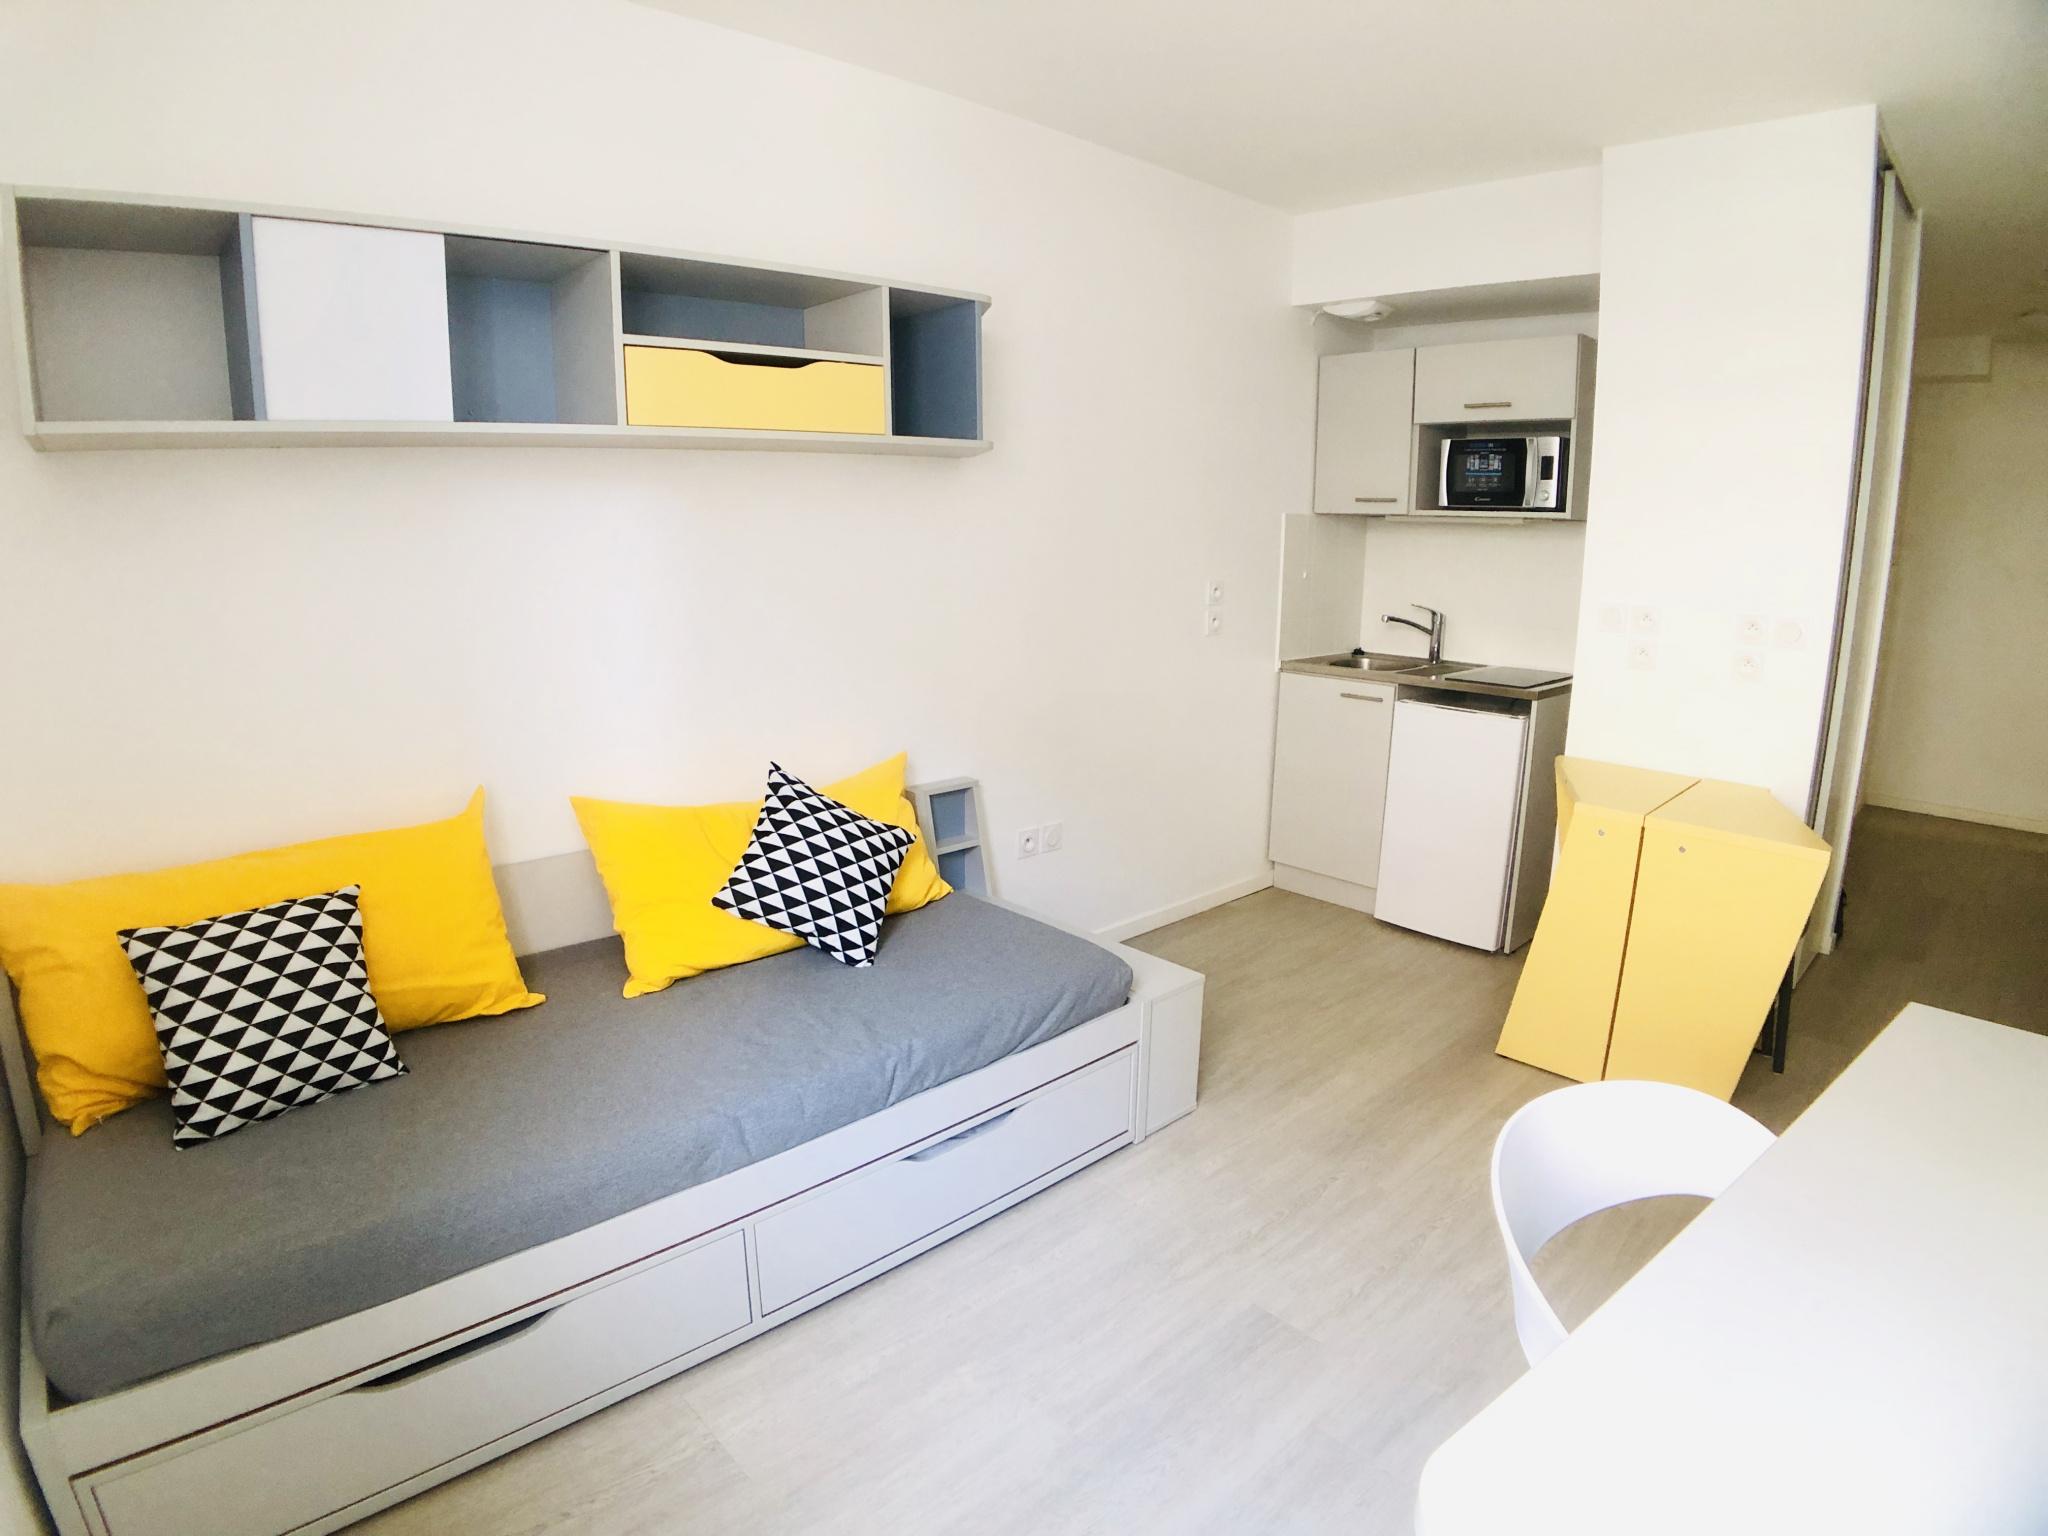 Location 13002 Quartier De La Major Studio Meuble Dans Residence Etudiante Mon Agence Constructa